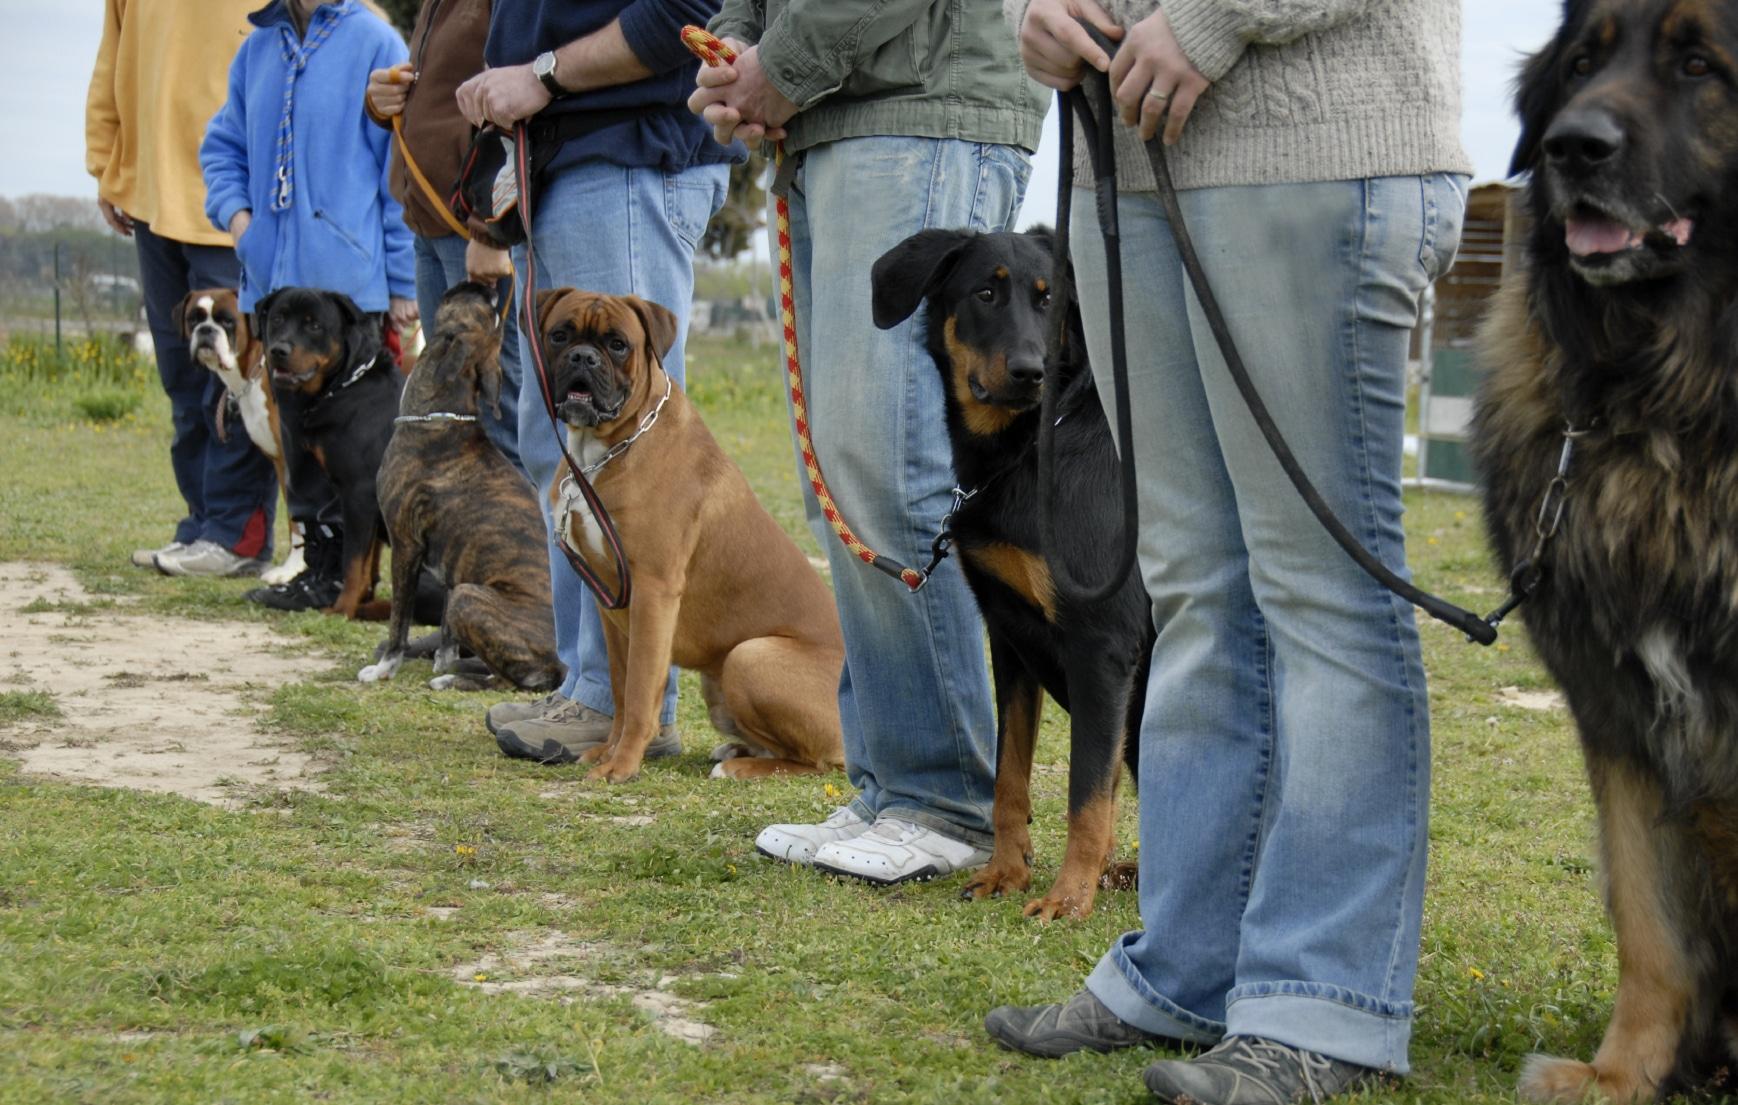 Sit, Ubu, sit! …Good dog!